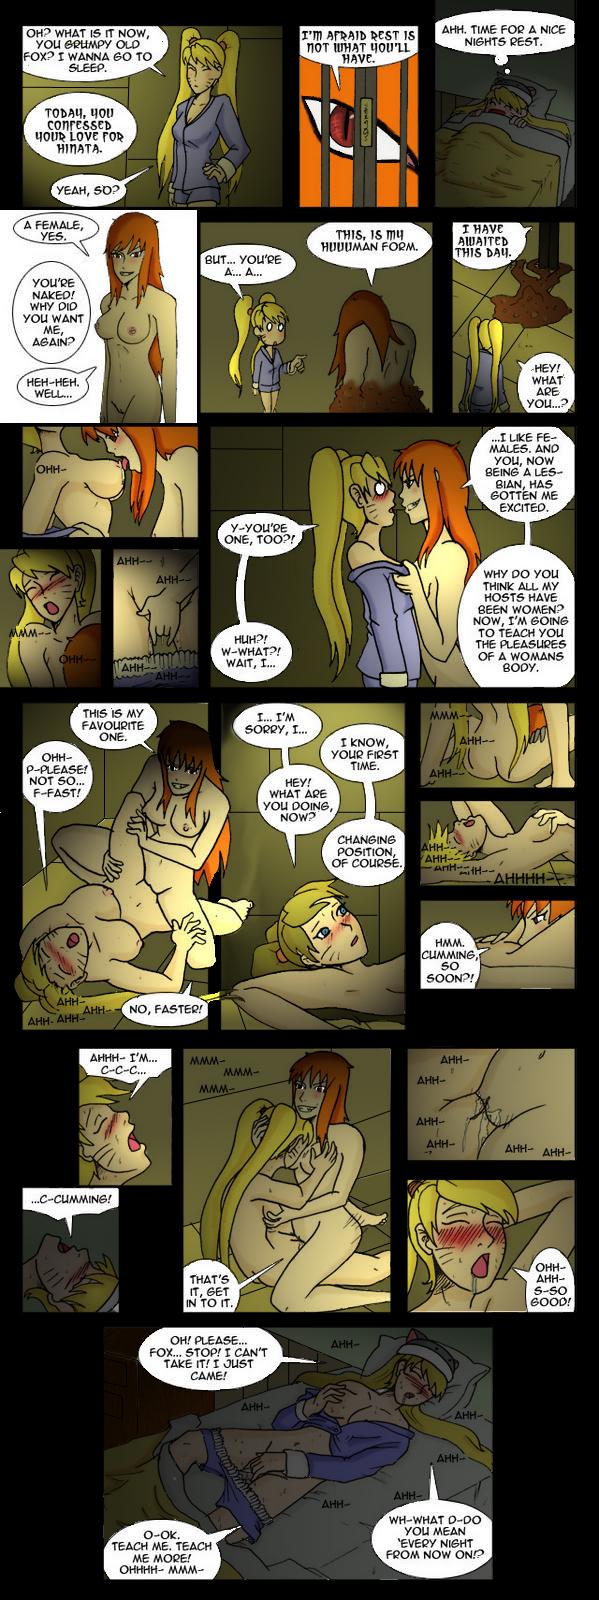 fanfiction kyuubi naruto x fem kitsune Scooby doo and daphne sex